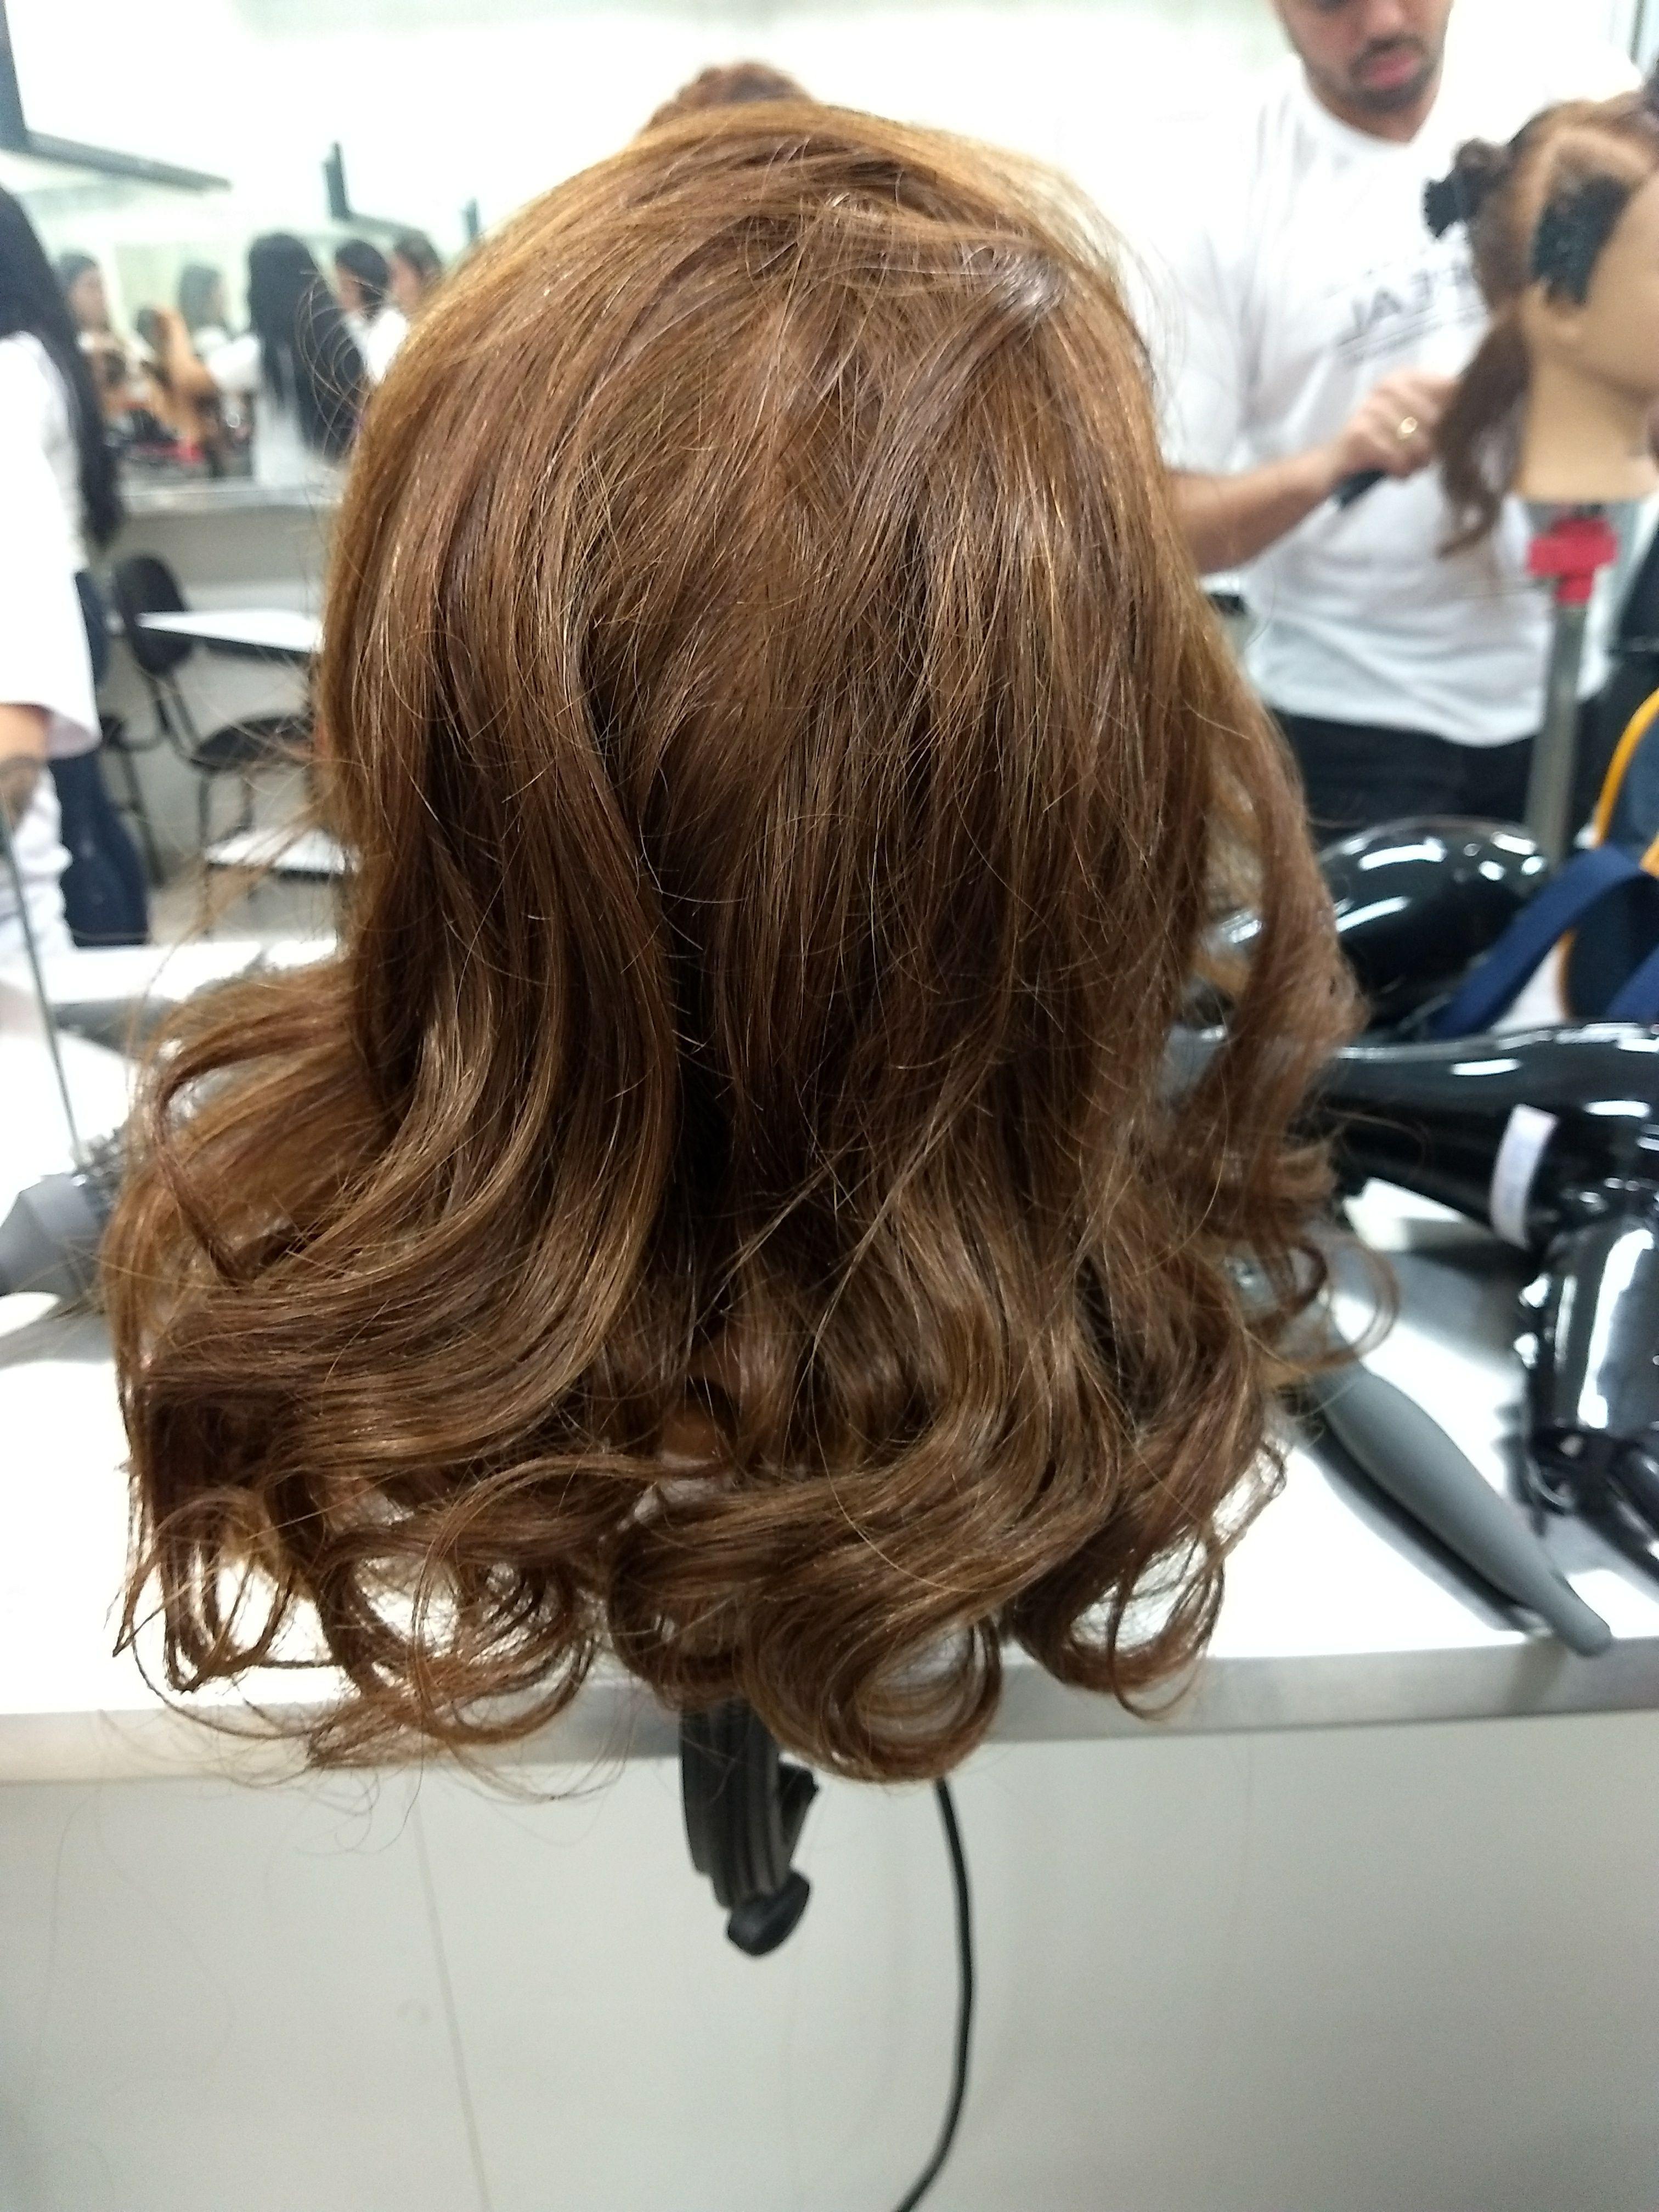 Escova modelada 90° cabelo auxiliar cabeleireiro(a) auxiliar cabeleireiro(a)